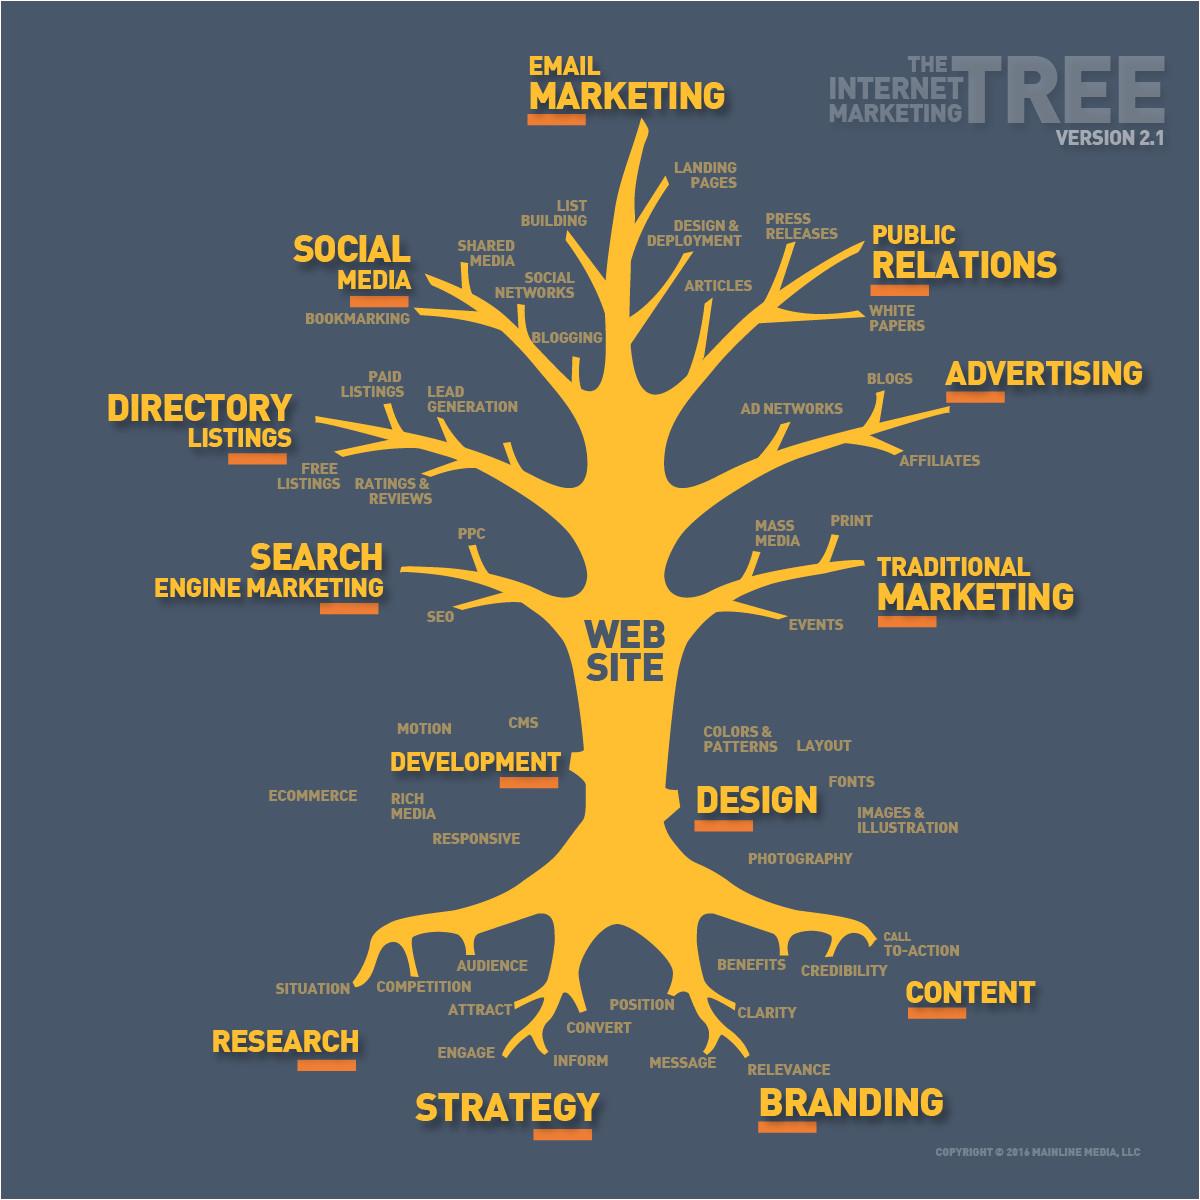 Strategy Tree Template the Internet Marketing Tree 2016 Update Mainline Media